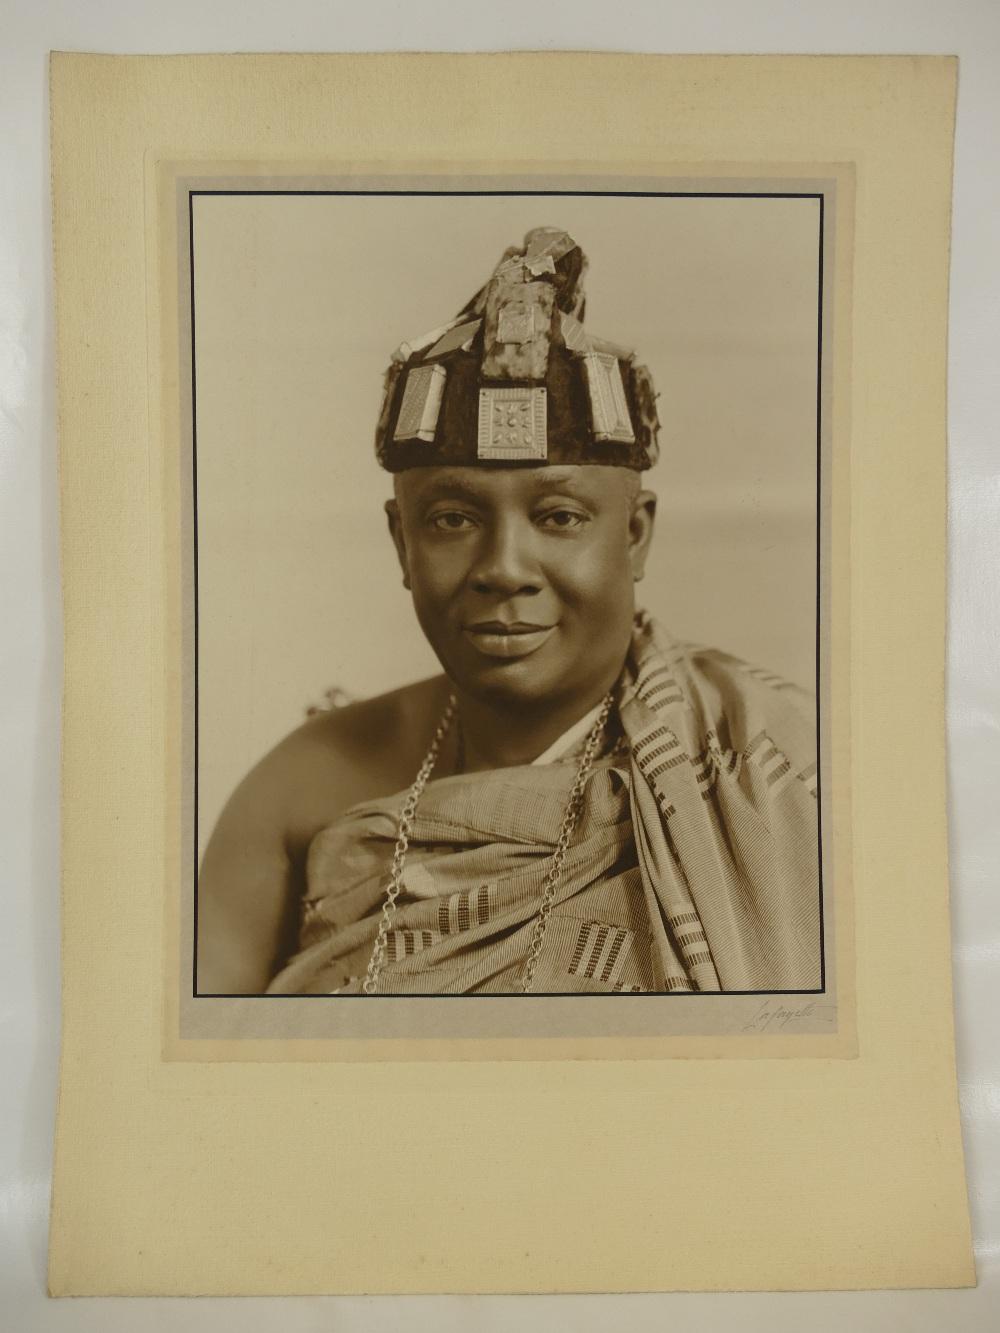 Lot 7 - Nana Sir Ofori Atta (1881-1943), Member of Executive Council of Gold Coast (Ghana).